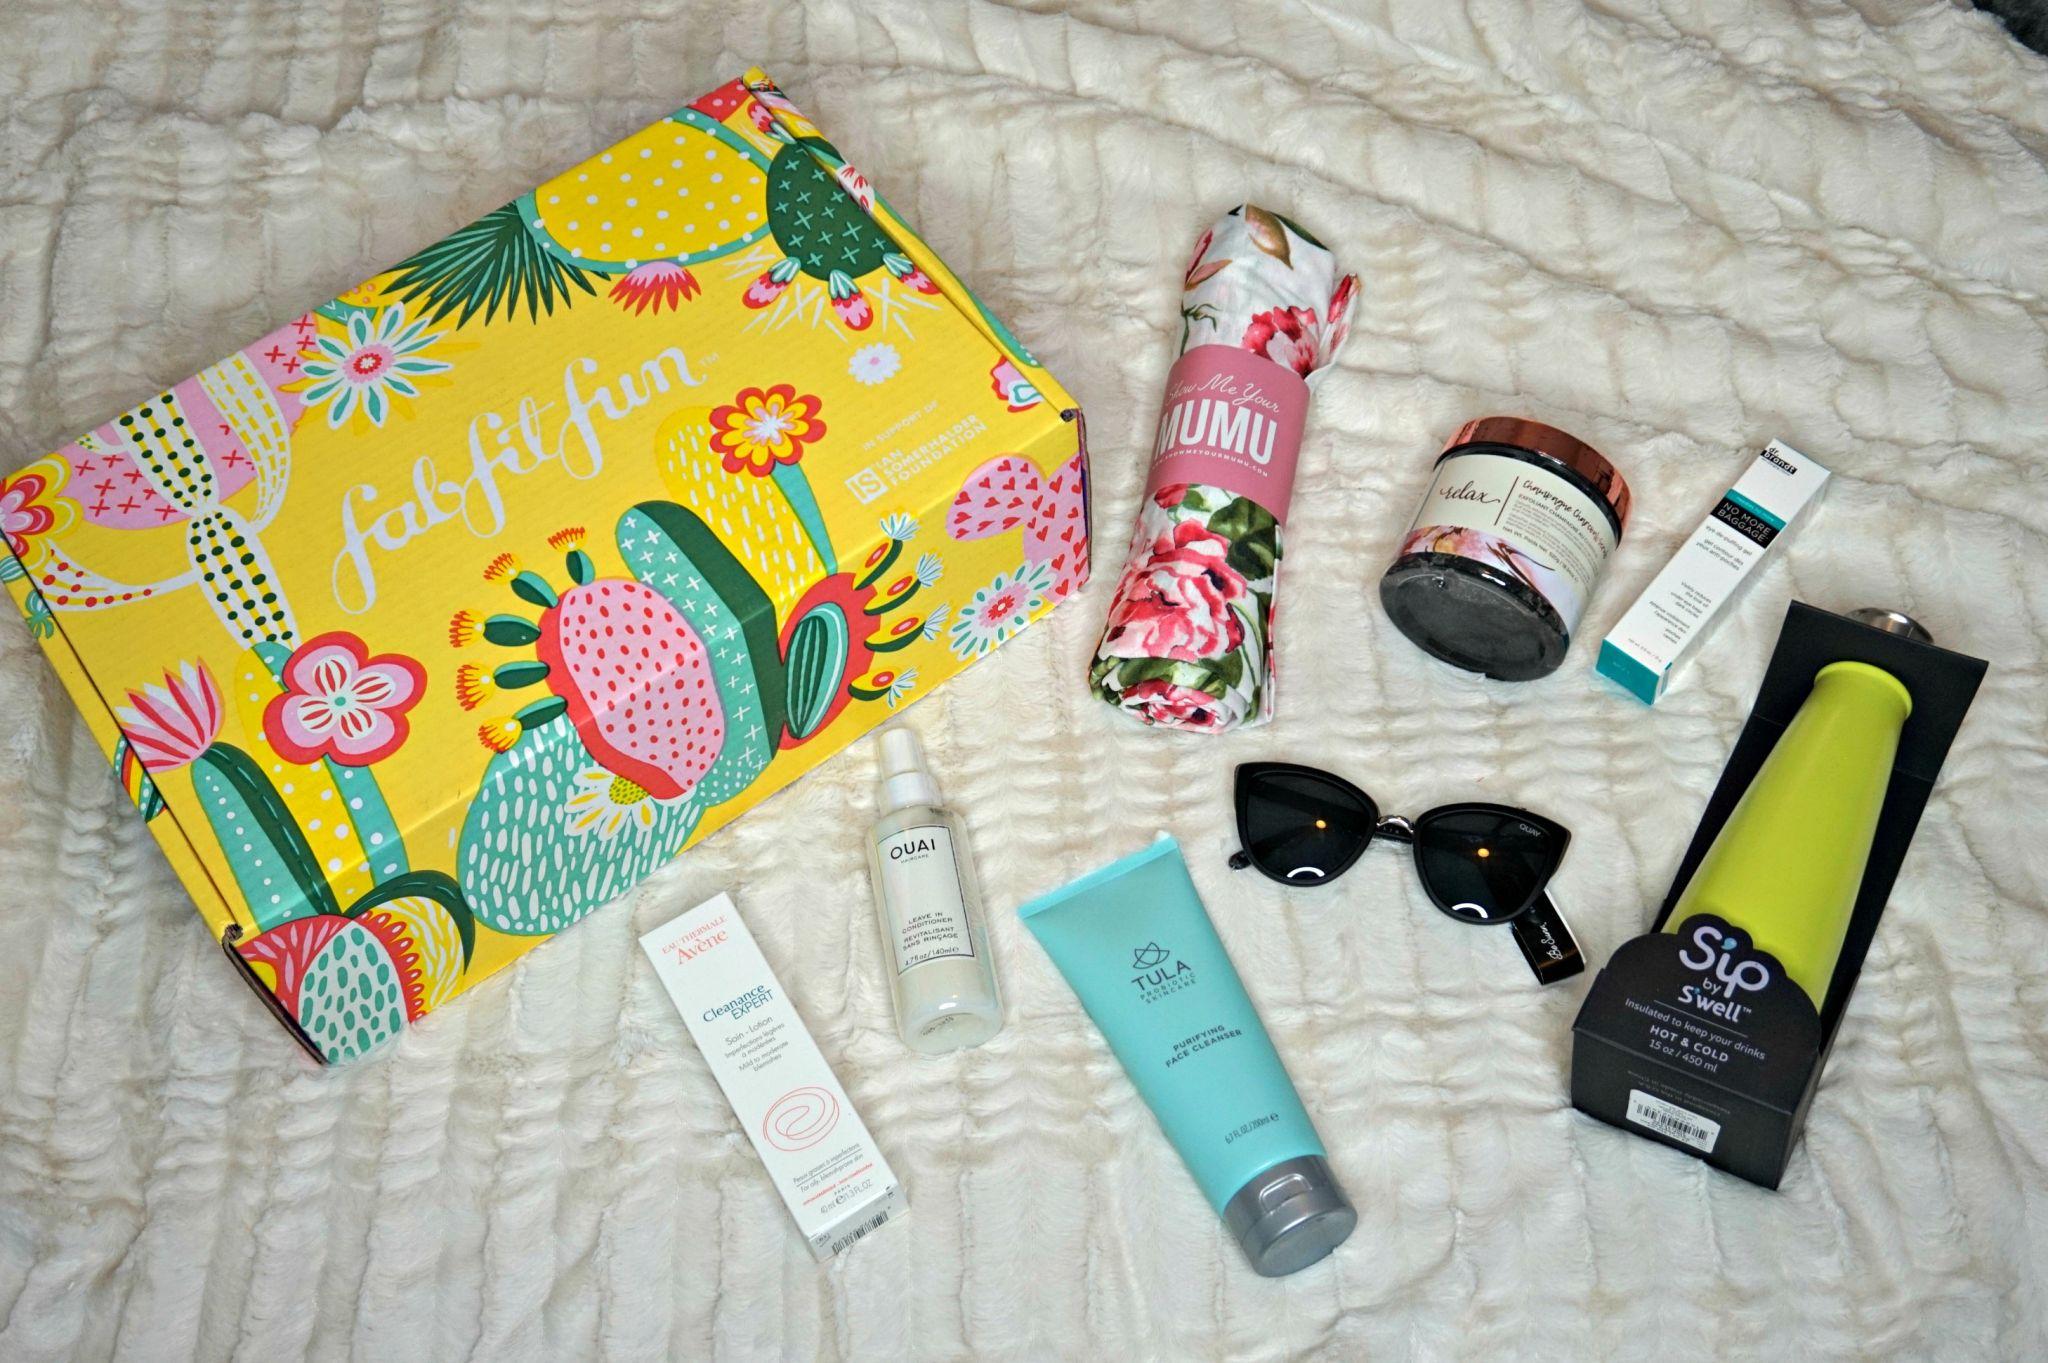 FabFitFun Spring Box 2019 // Honest FabFitFun Review // Subscription Service // Seasonal Subscription Box   Beauty With Lily